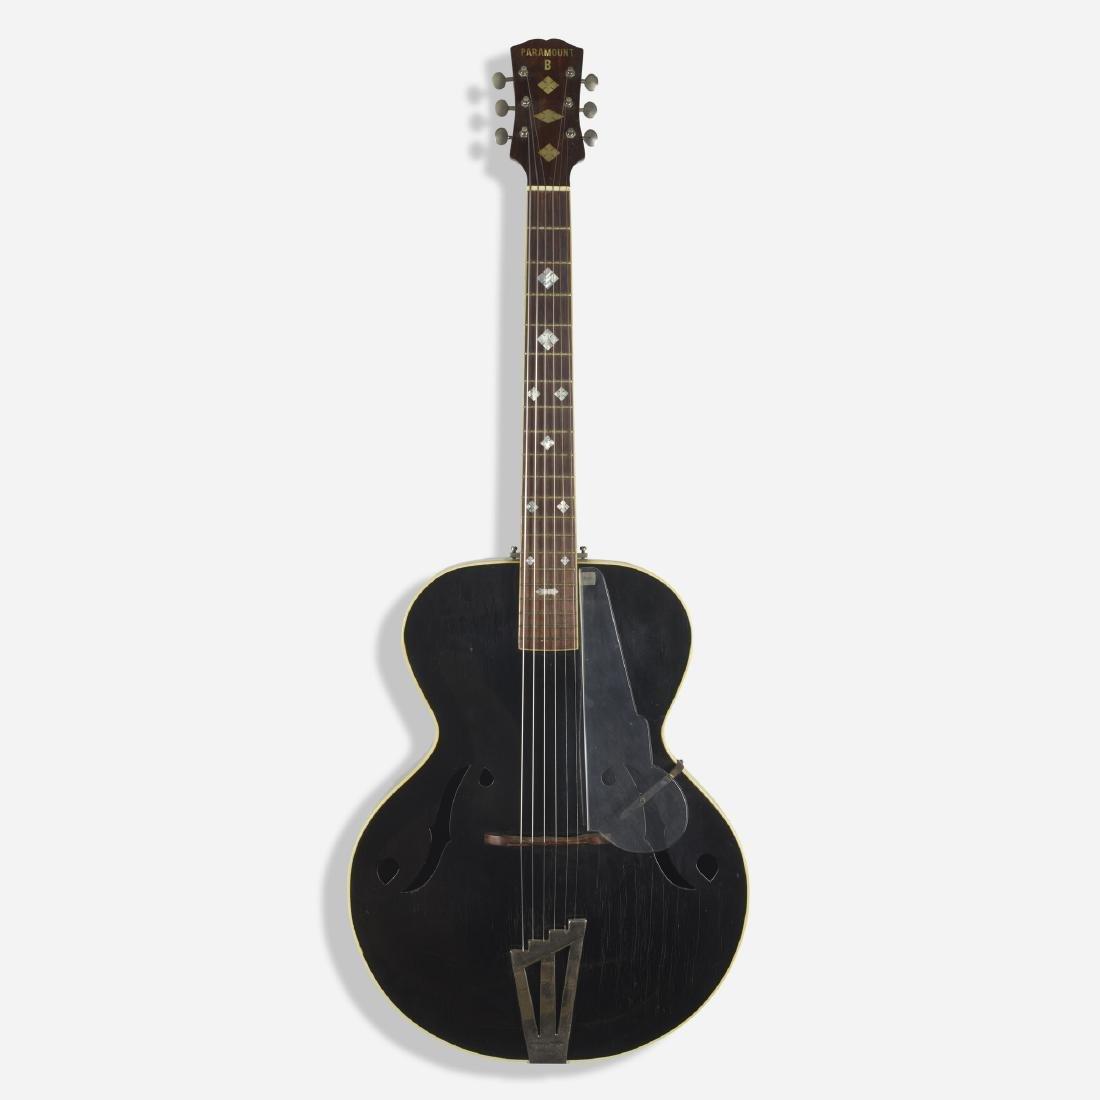 Paramount, B Series Archtop guitar